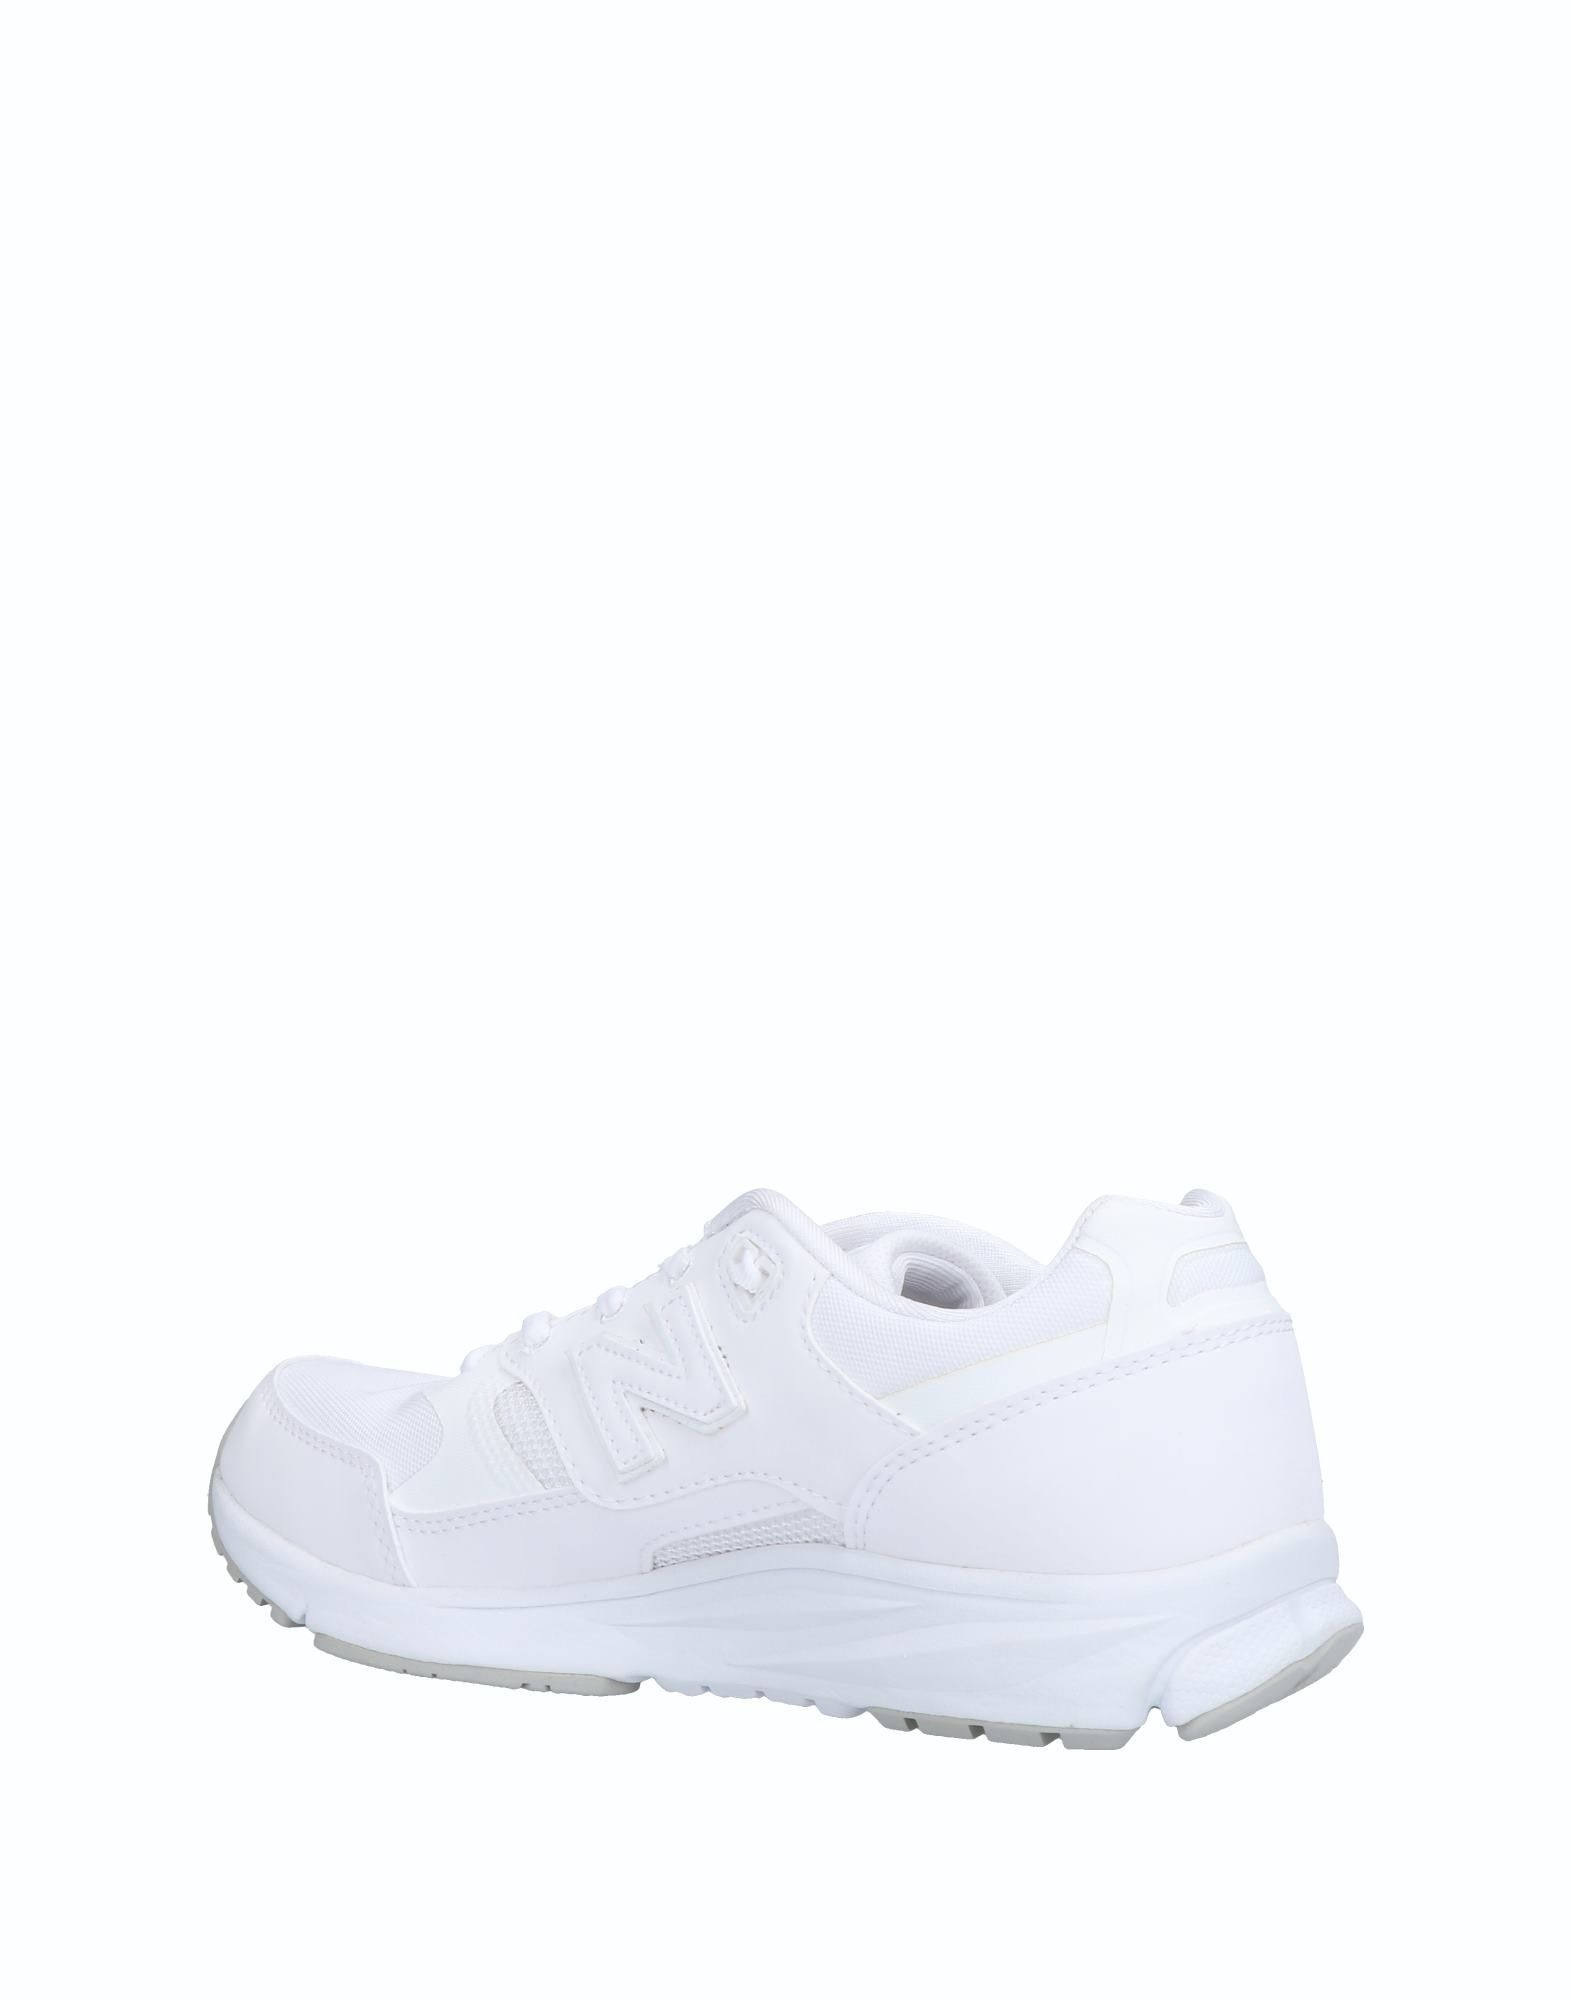 Rabatt Balance echte Schuhe New Balance Rabatt Sneakers Herren  11503277UN d2d283